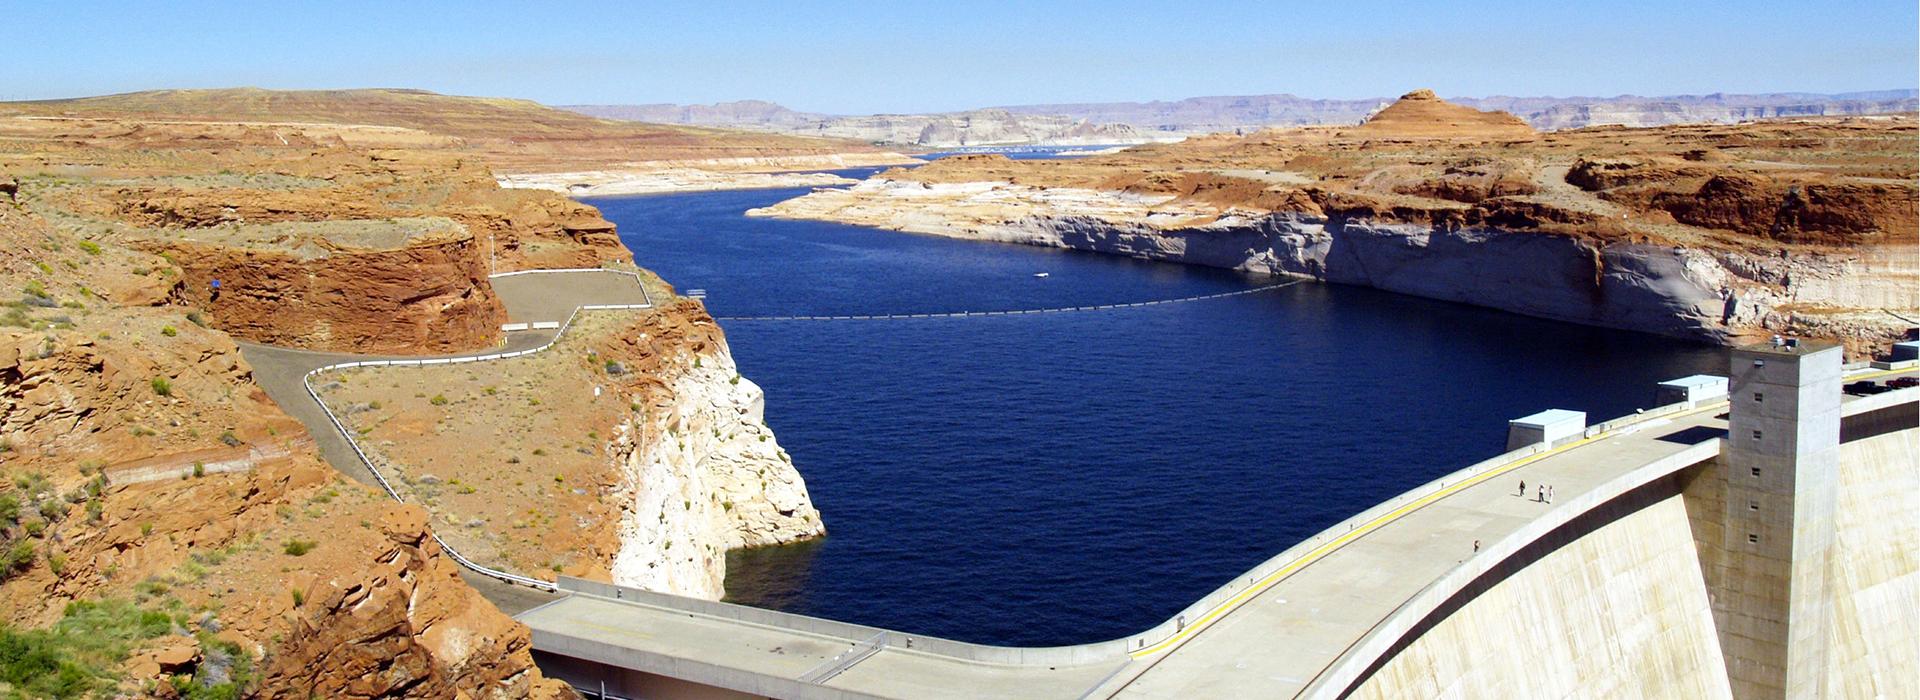 Lake Powell & Glen Canyon Dam in Arizona